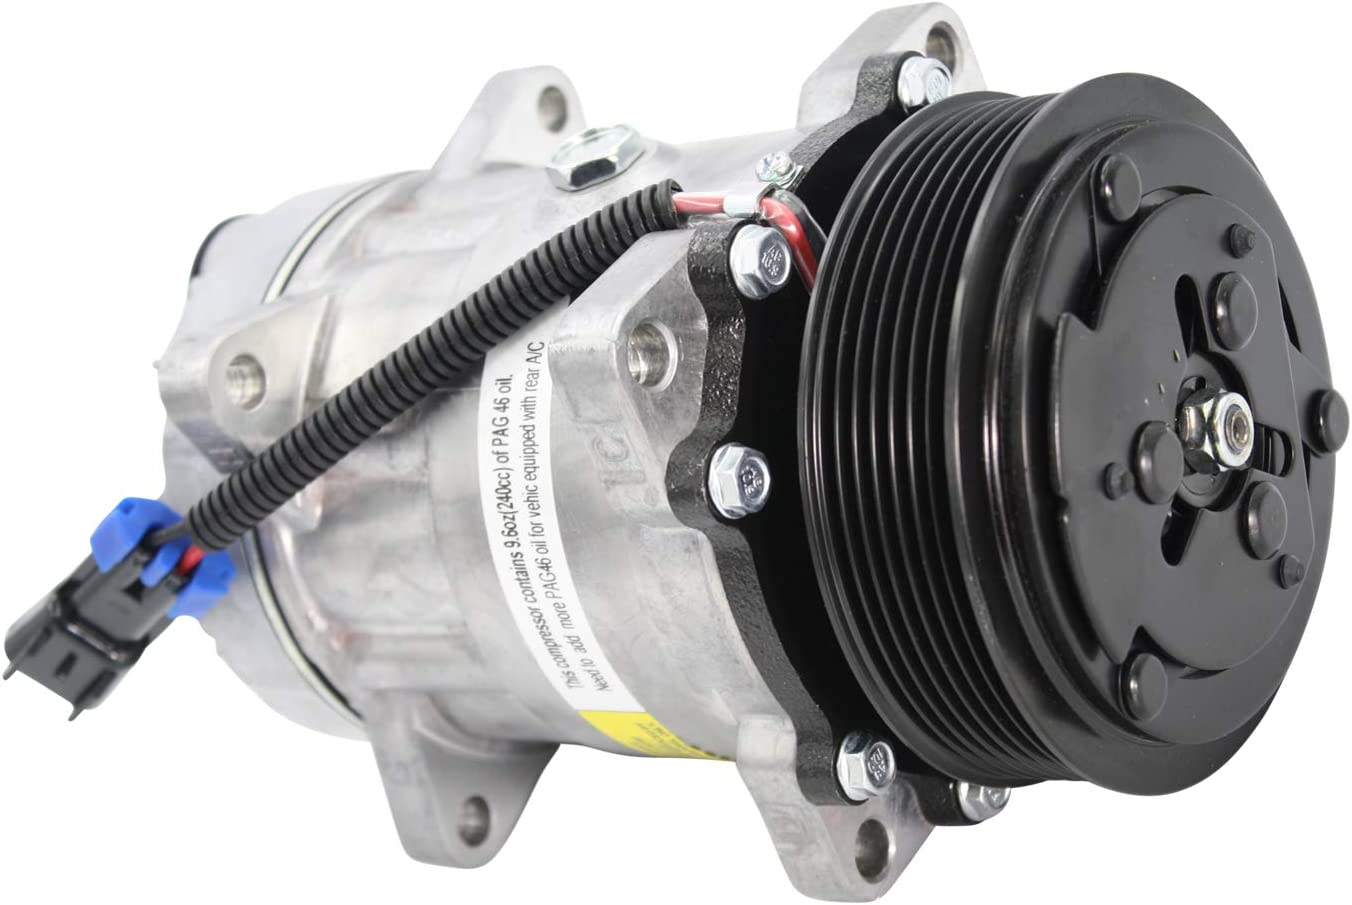 New Sanden Type Kodiak GMC Topkick AC Compressor 4618 4350 4010 With Clutch